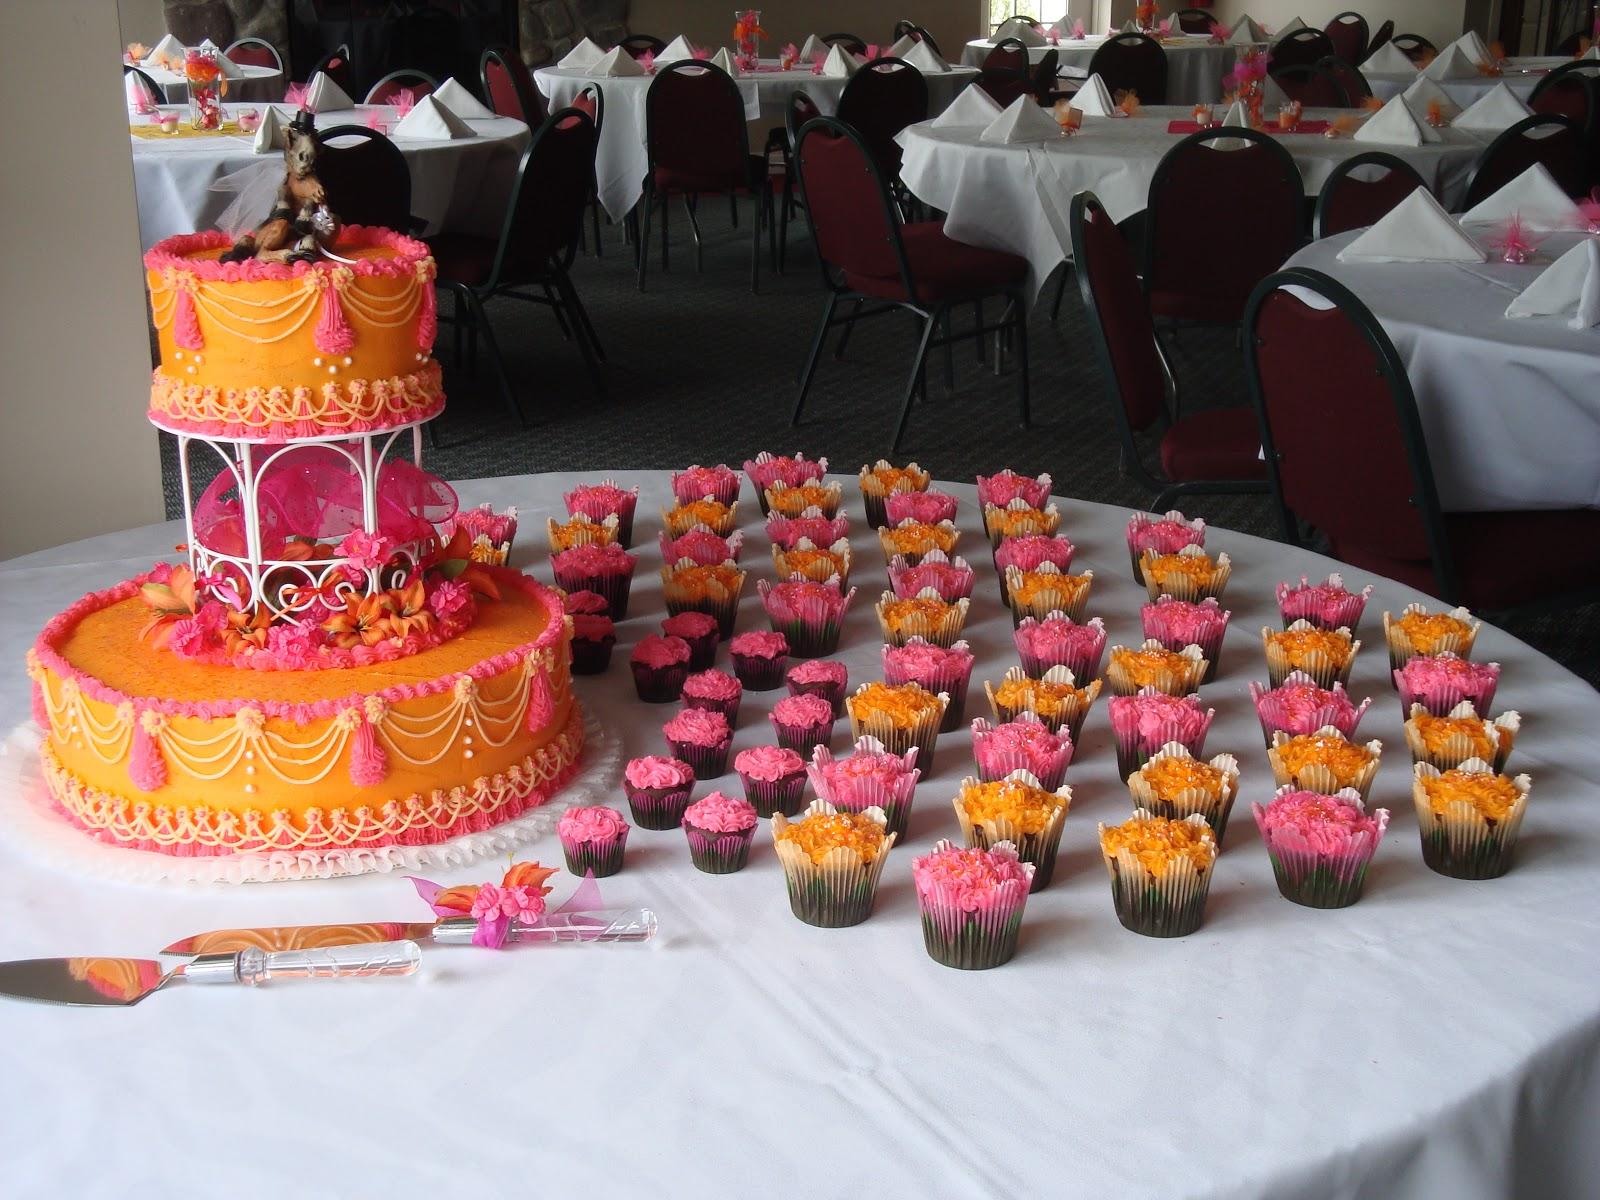 2 layer 2 levels wedding cake flower cupcakes beautiful wedding 2 layer 2 levels wedding cake flower cupcakes beautiful wedding izmirmasajfo